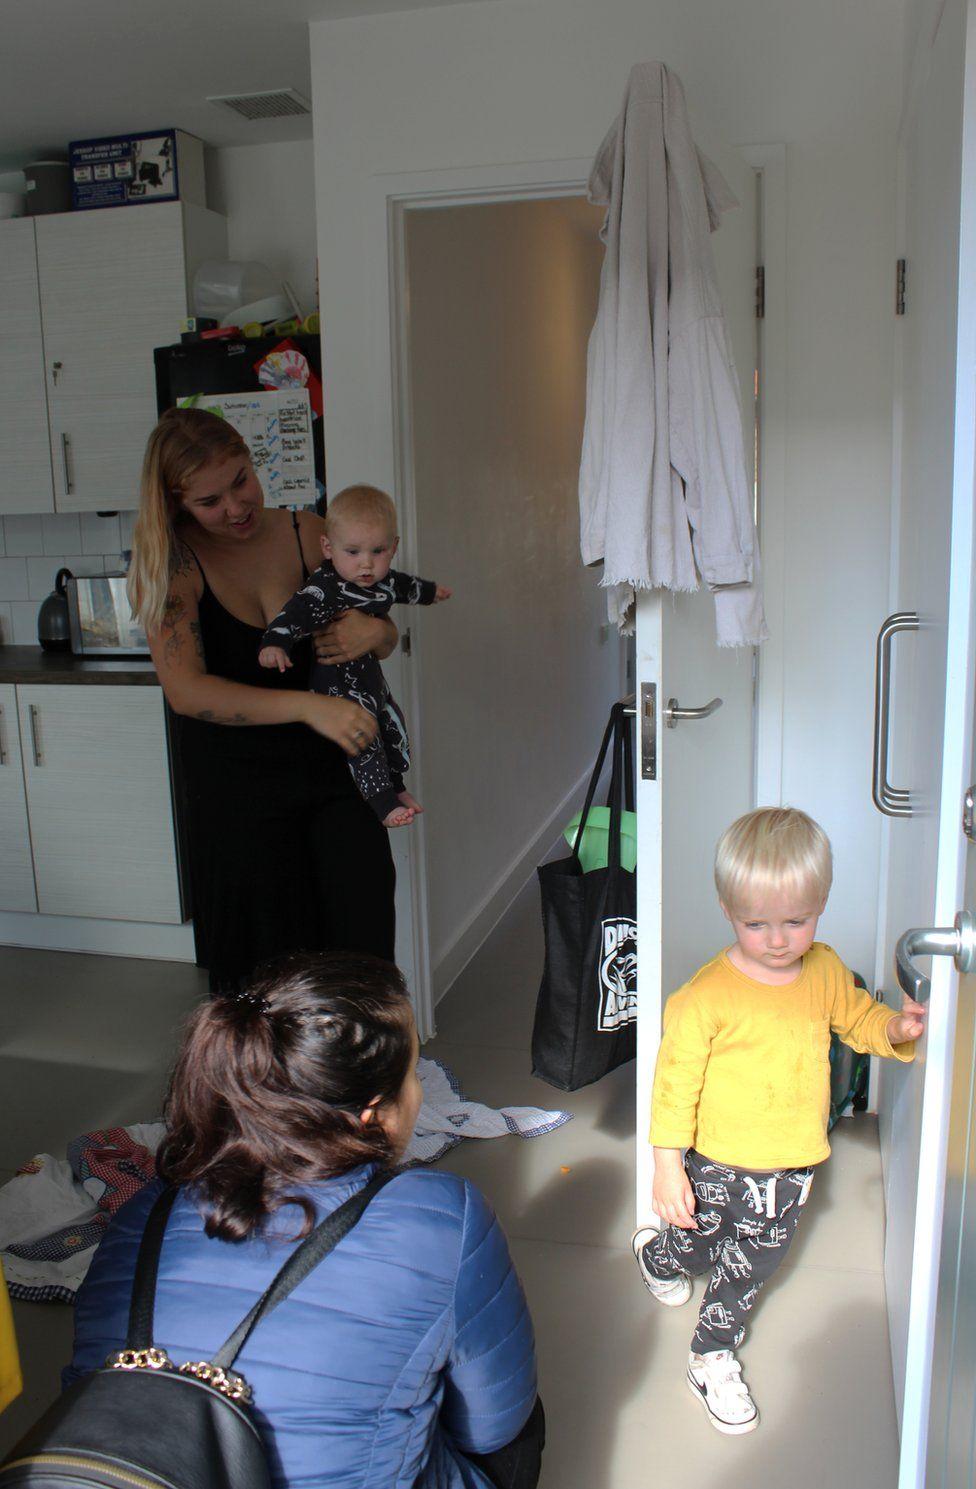 A woman crouches down to greet a little boy